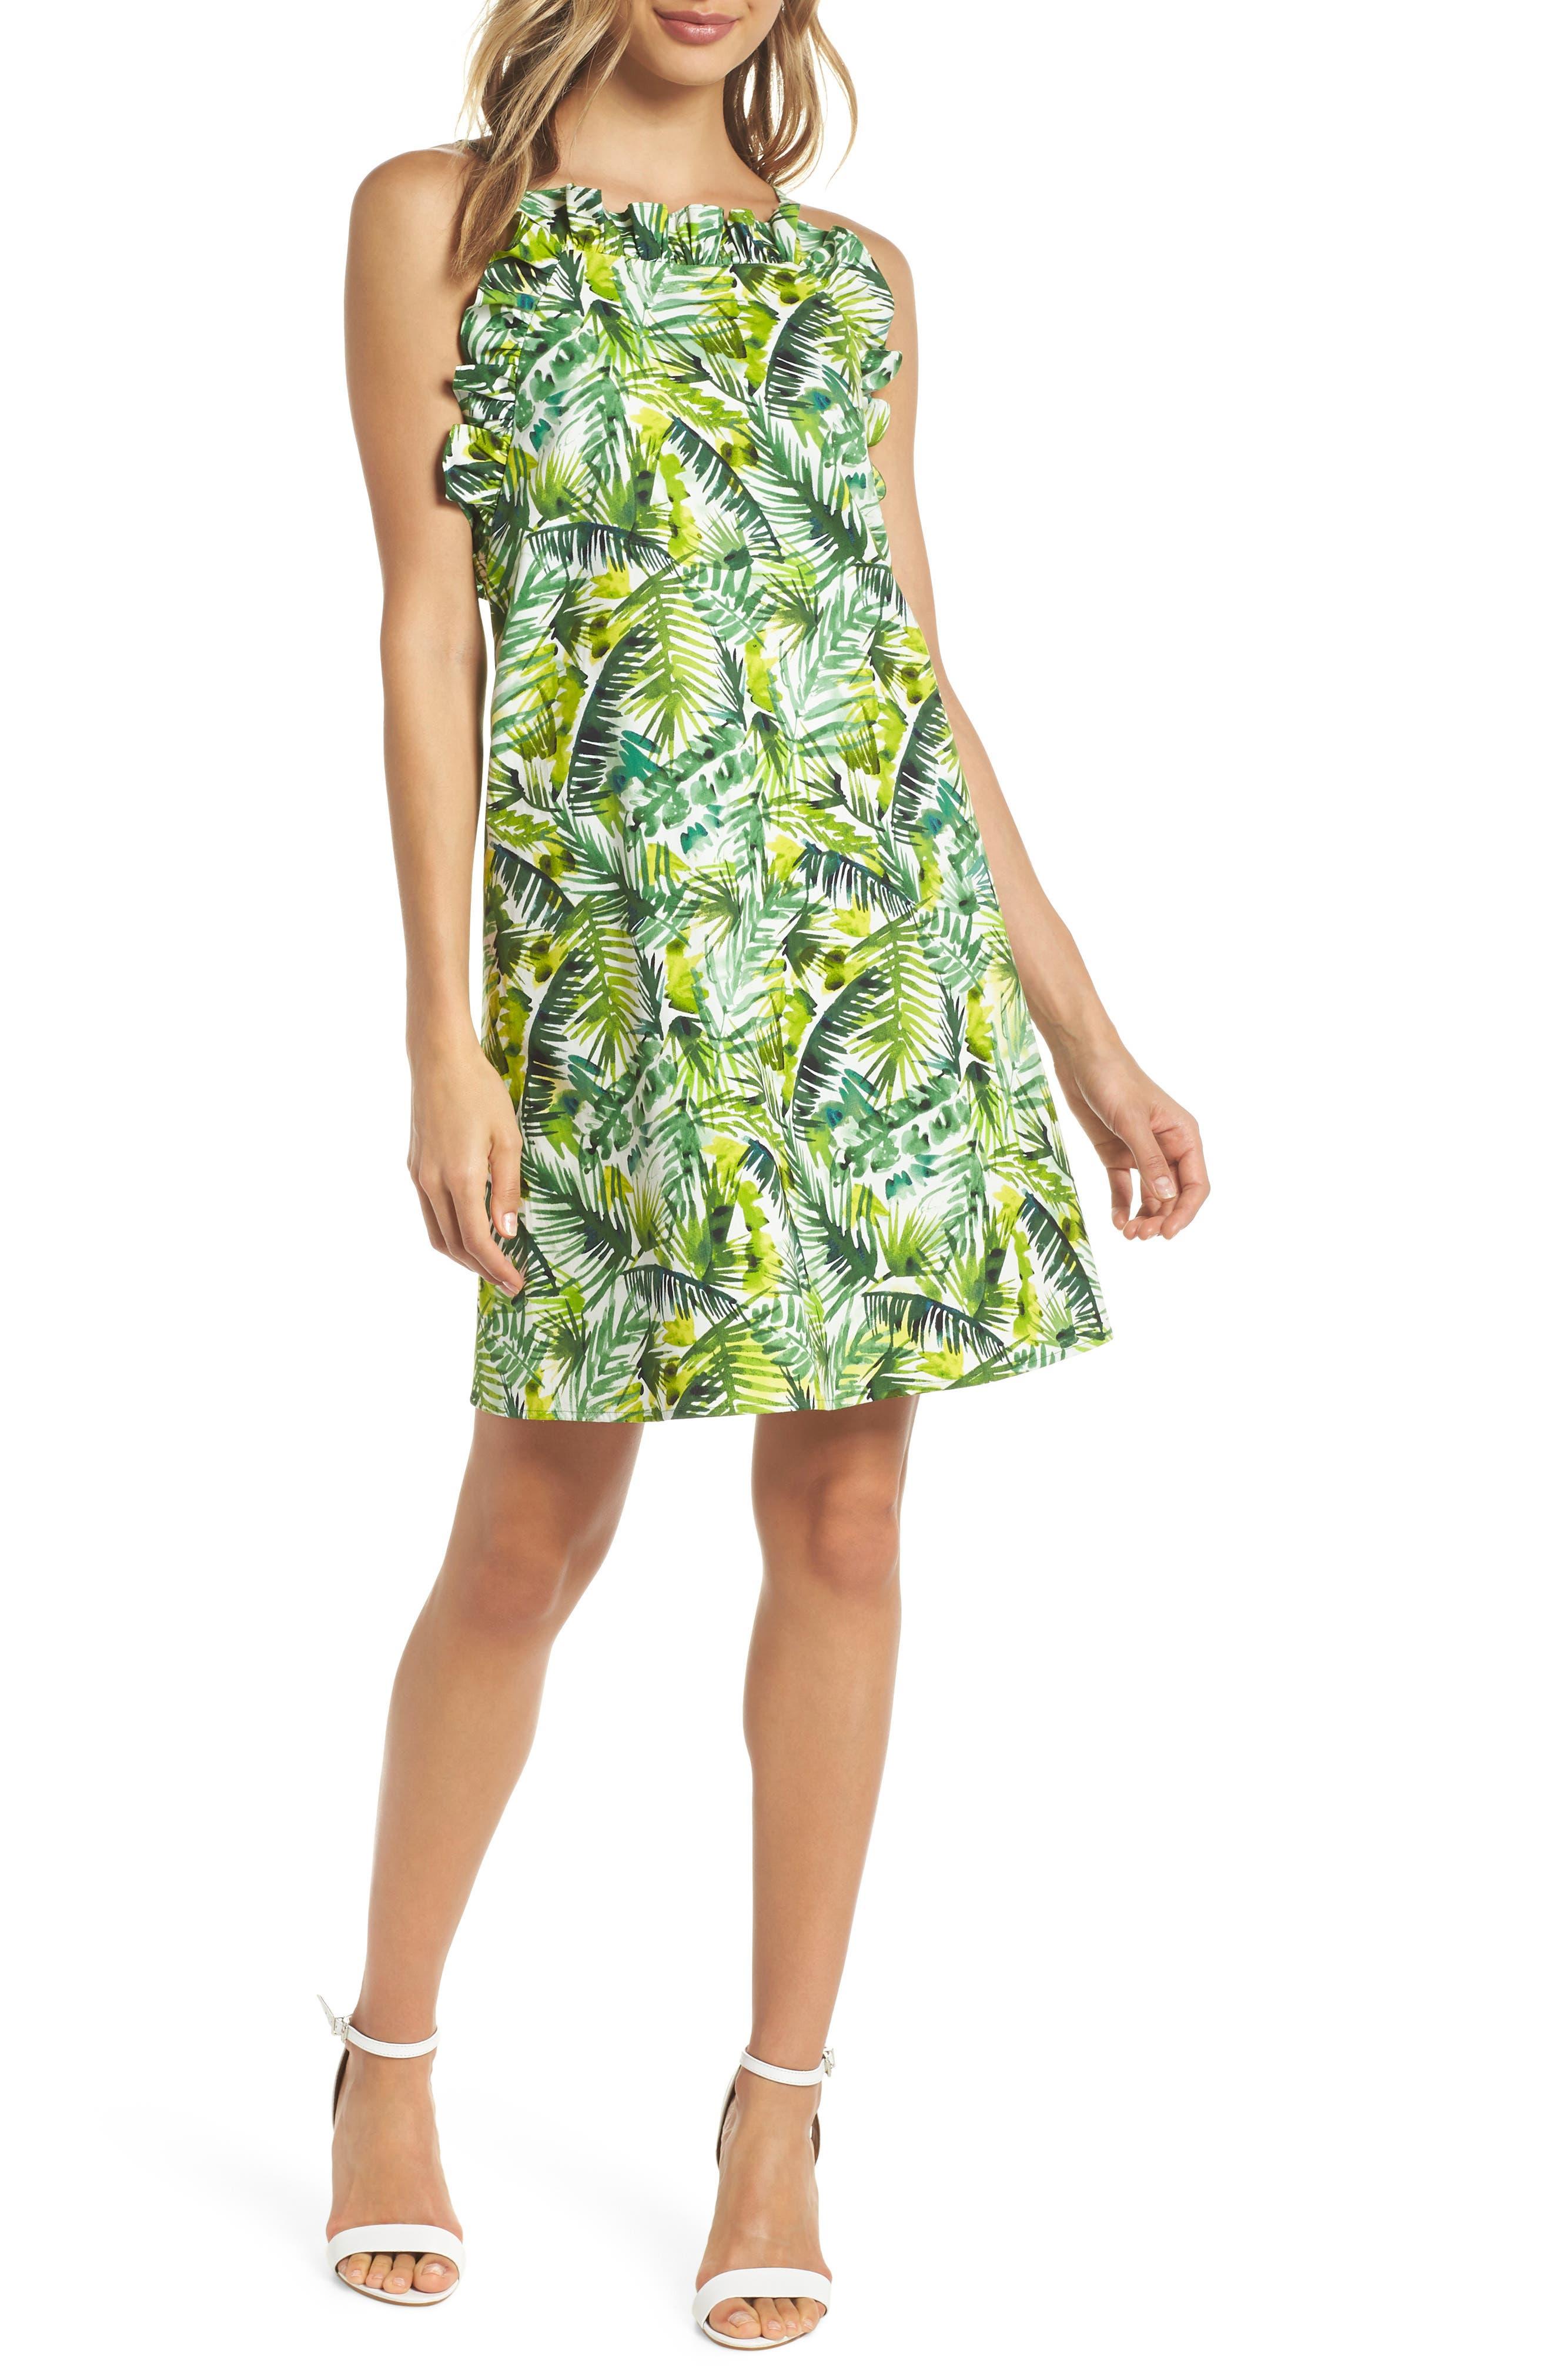 Ruffle Top Shift Dress,                             Main thumbnail 1, color,                             Soft White/ Green